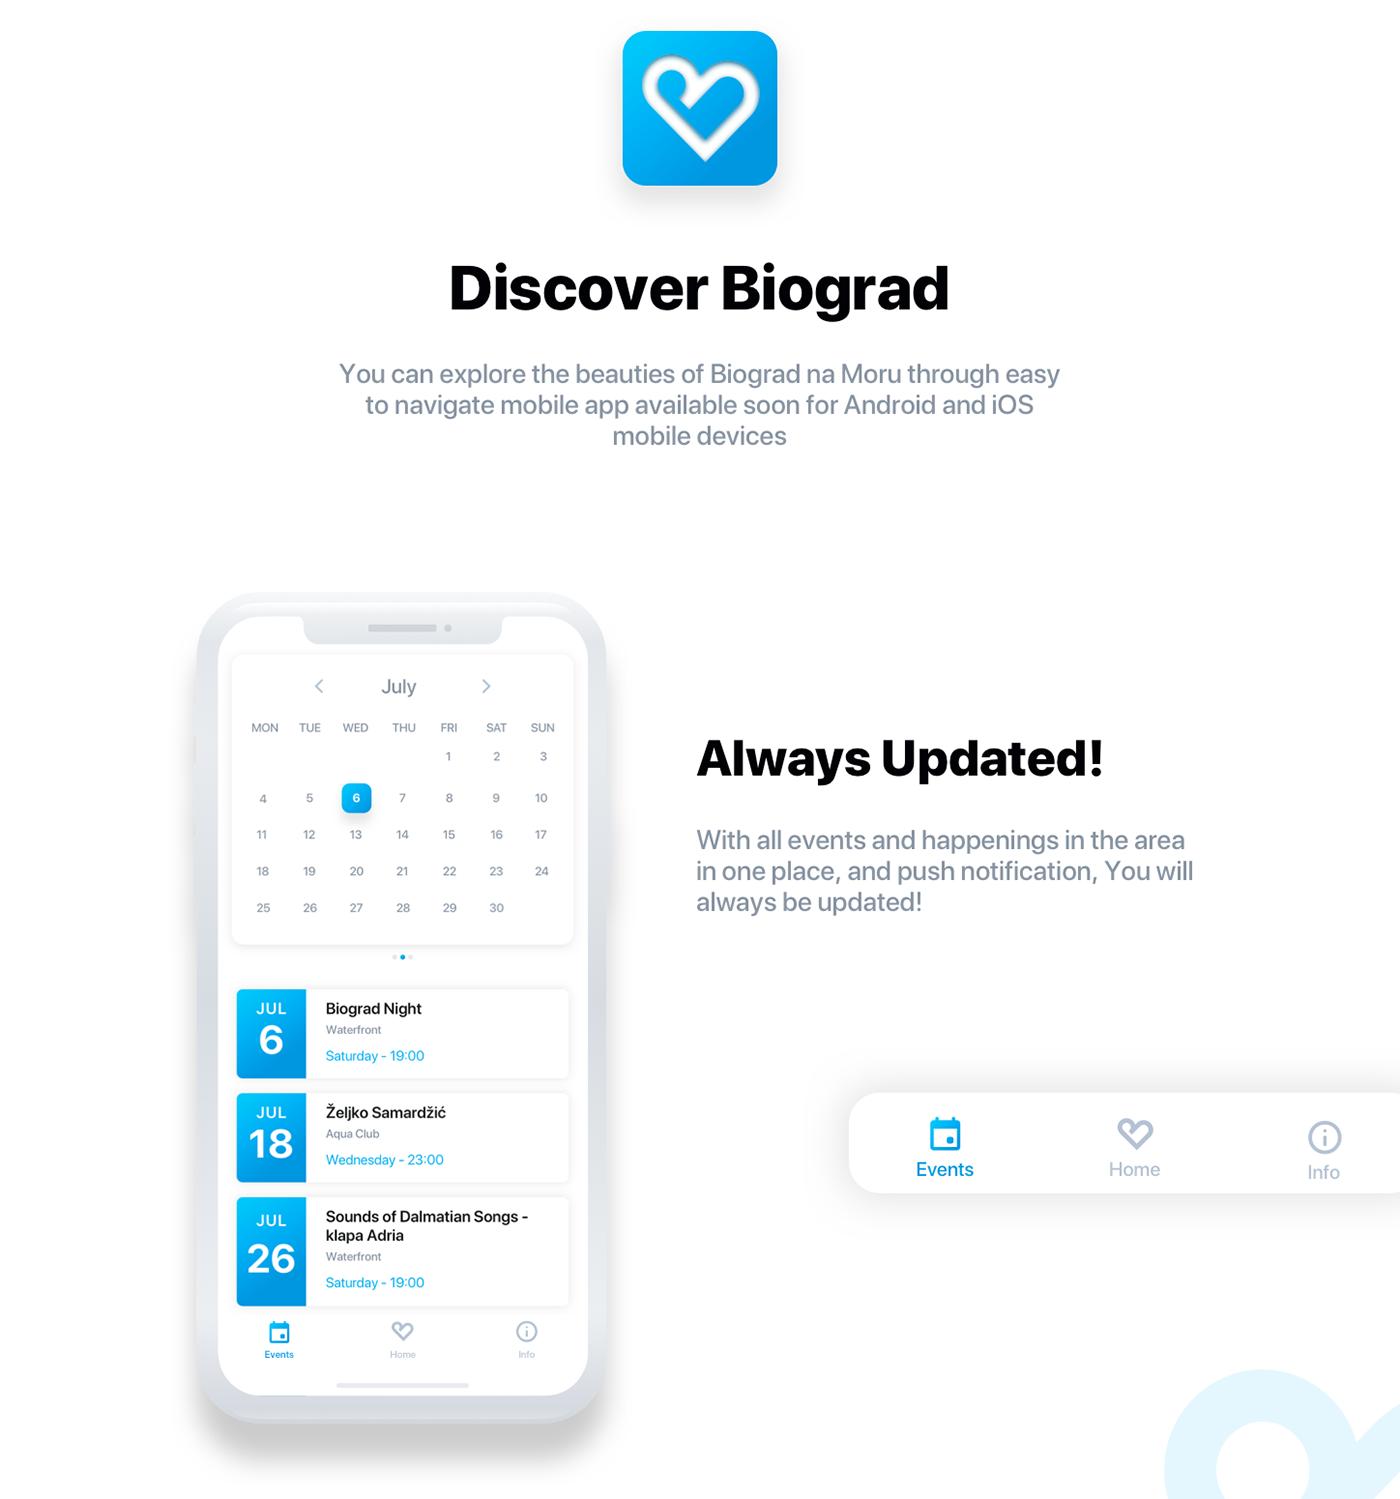 Mobile app mobile tourism application app ux UI uxui uxdesign design